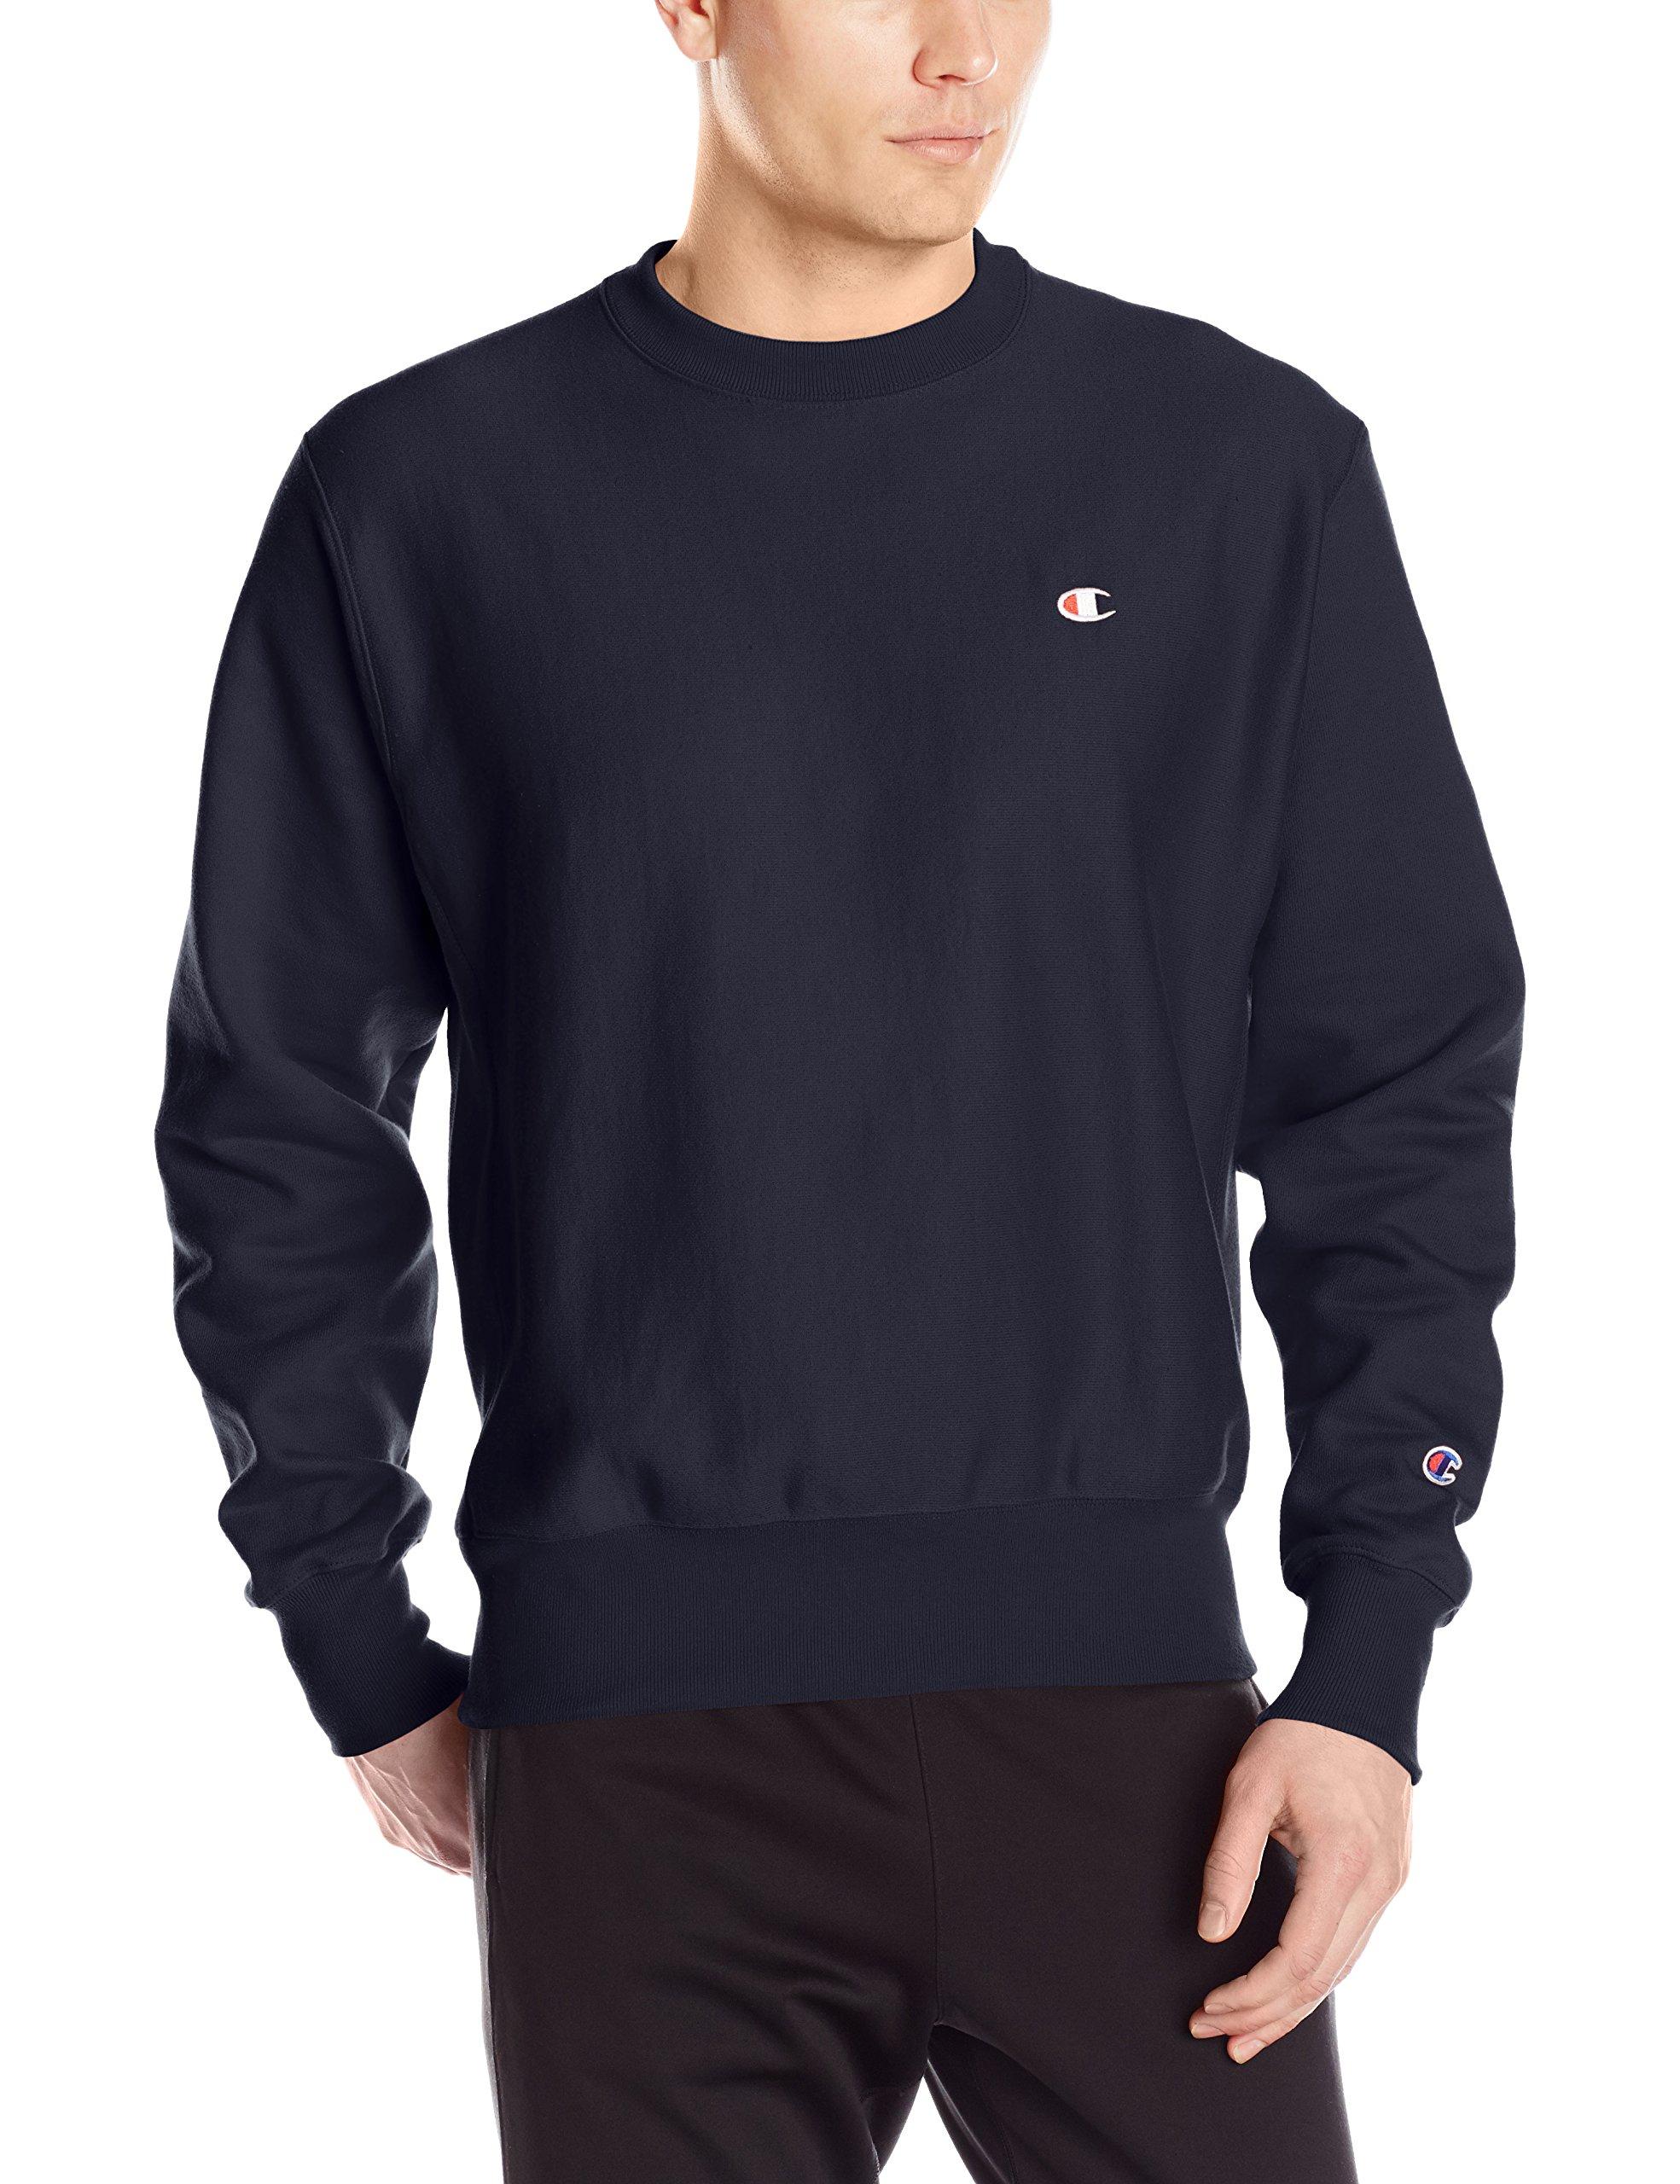 Champion LIFE Men's Reverse Weave Sweatshirt, Navy, Large by Champion LIFE